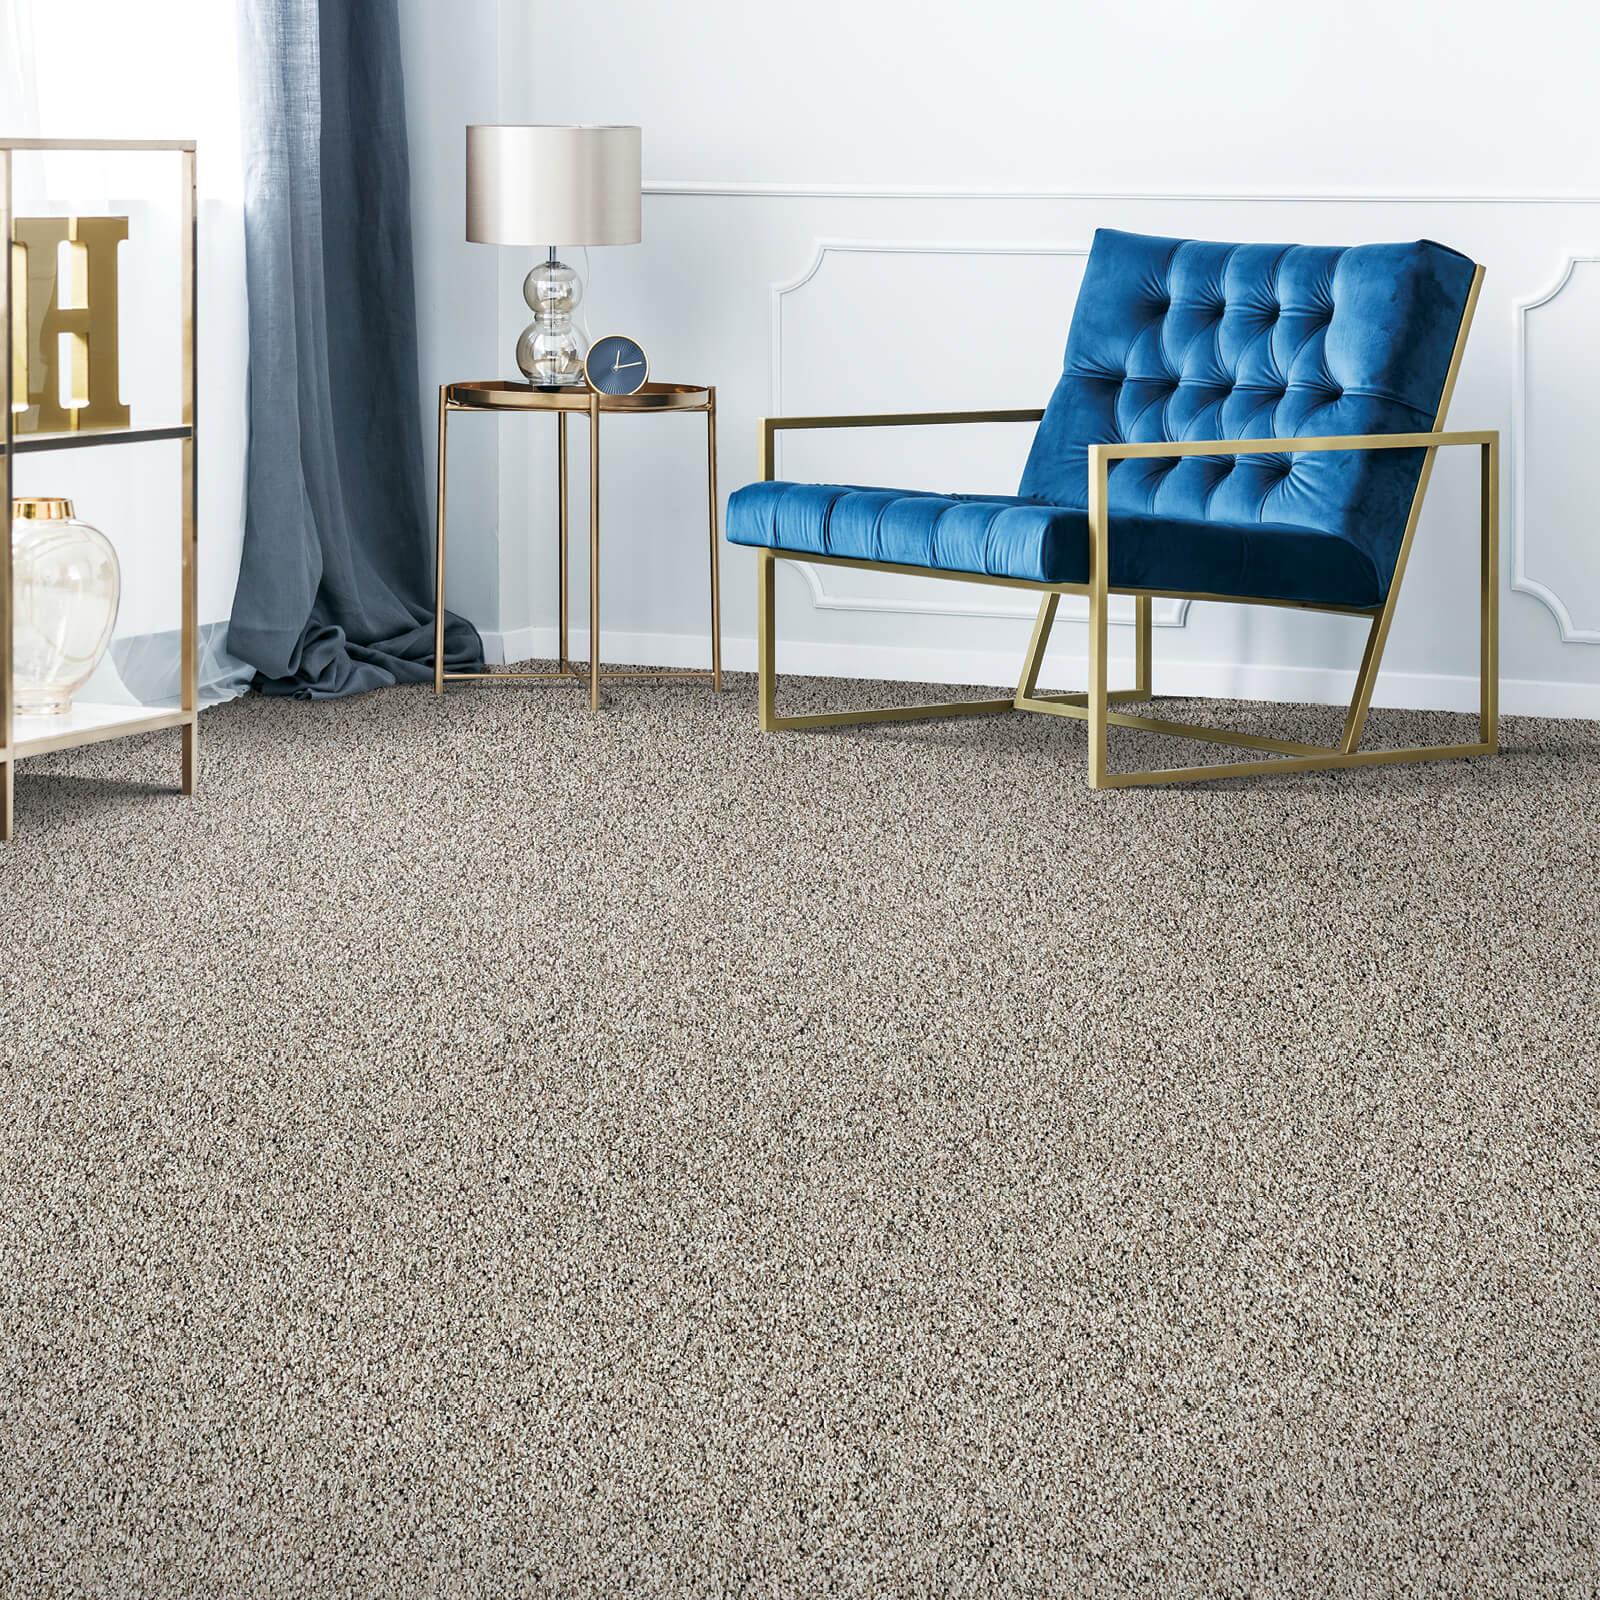 Choose a Carpet for Allergies | Shan's Carpets & Fine Flooring